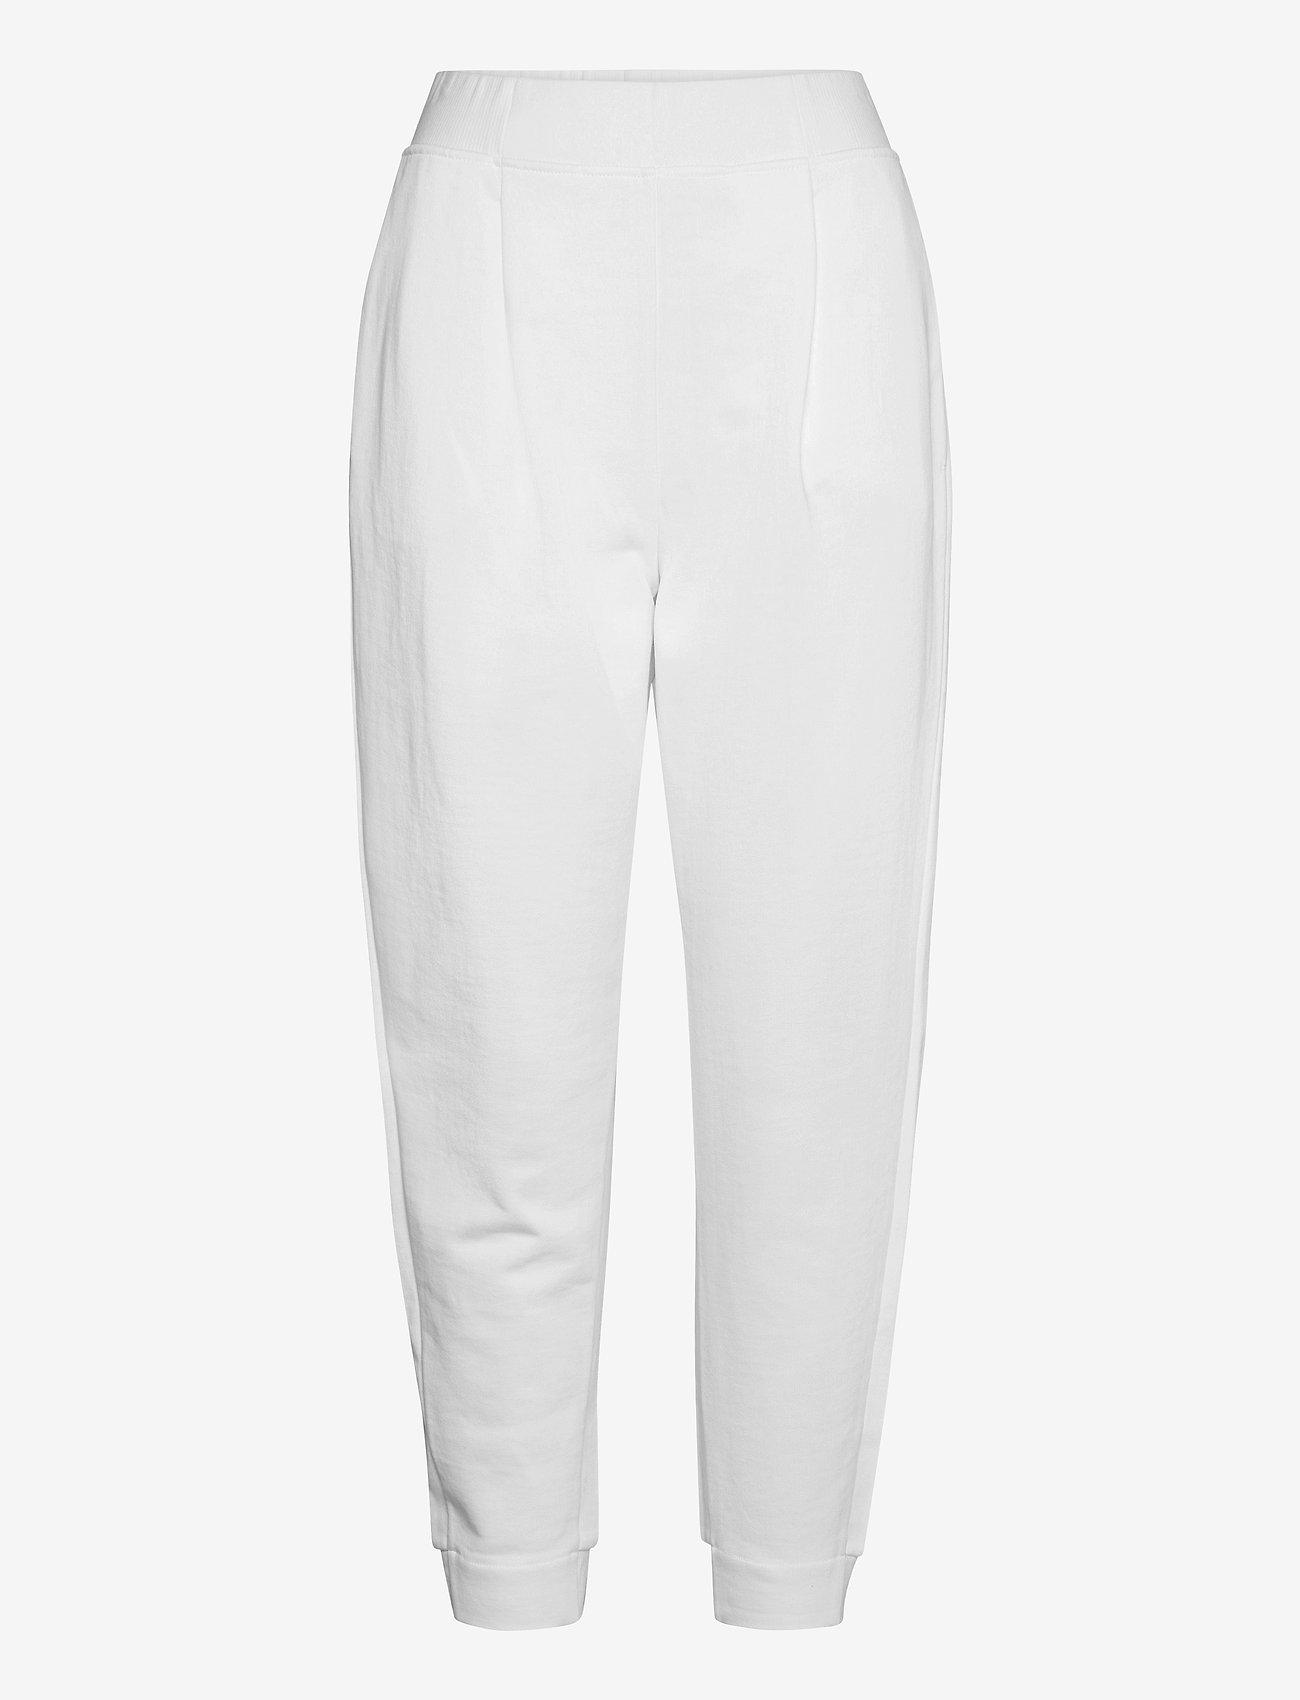 Max Mara Leisure - BRIC - casual trousers - optical white - 0